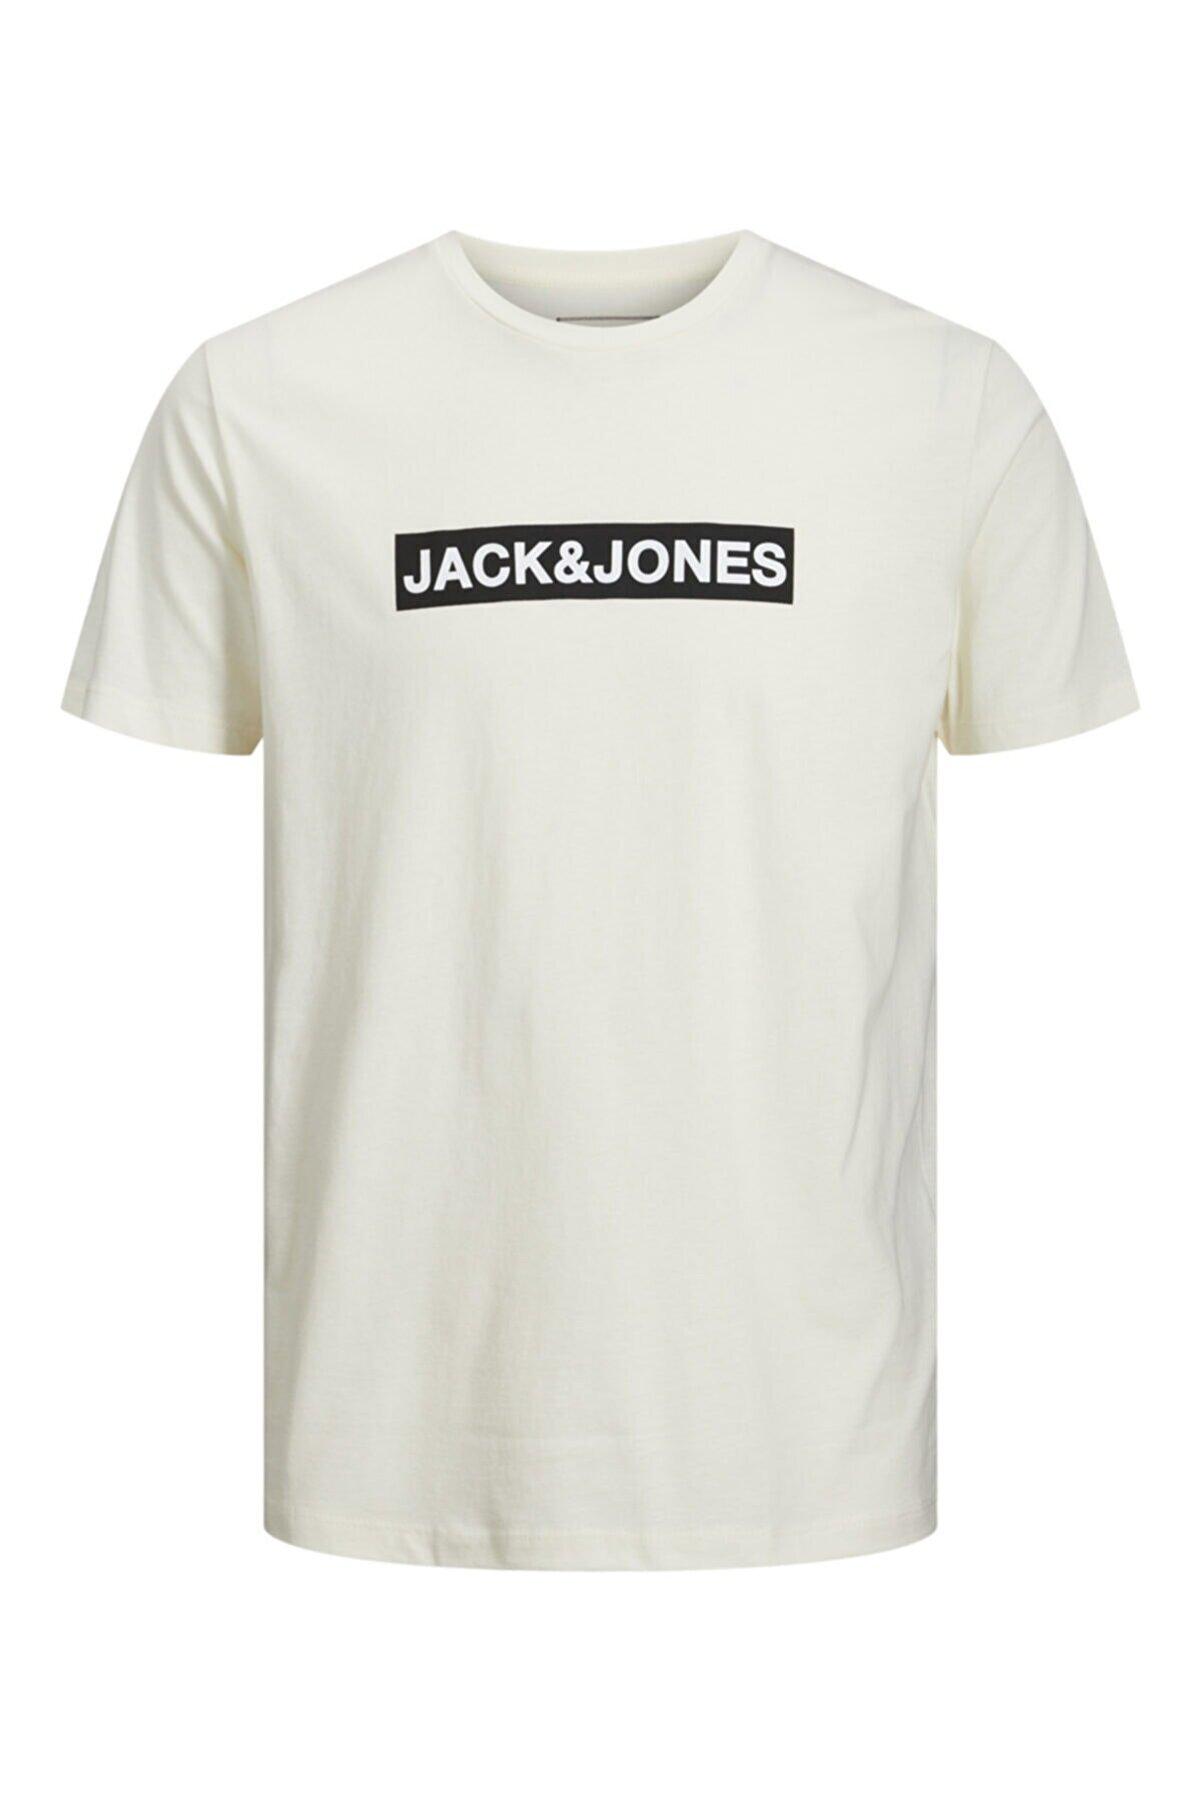 Jack & Jones Erkek Bisiklet Yaka T-shirt